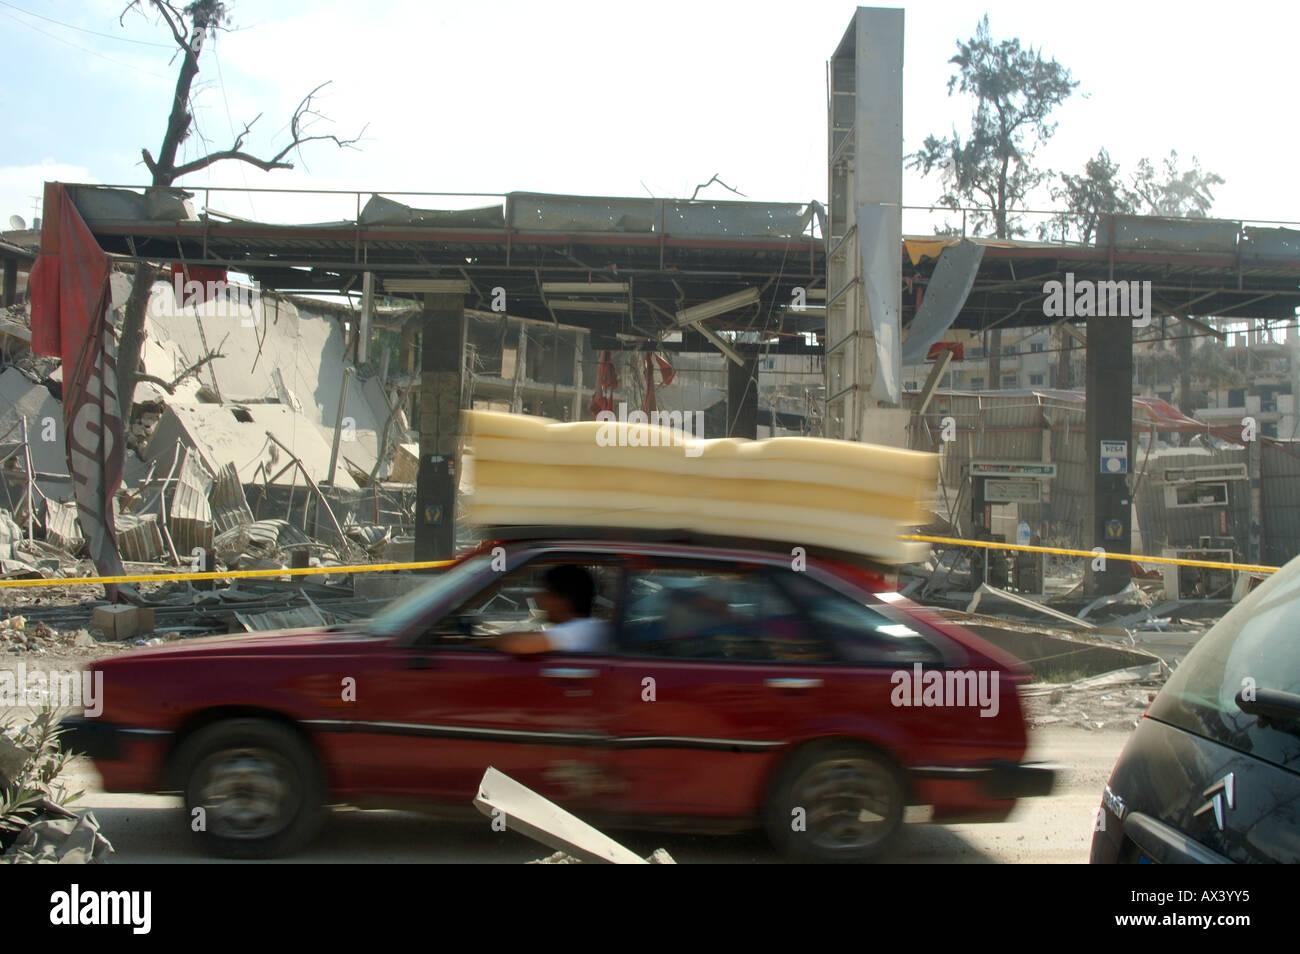 12 july 2006 israely war against lebanon - Stock Image